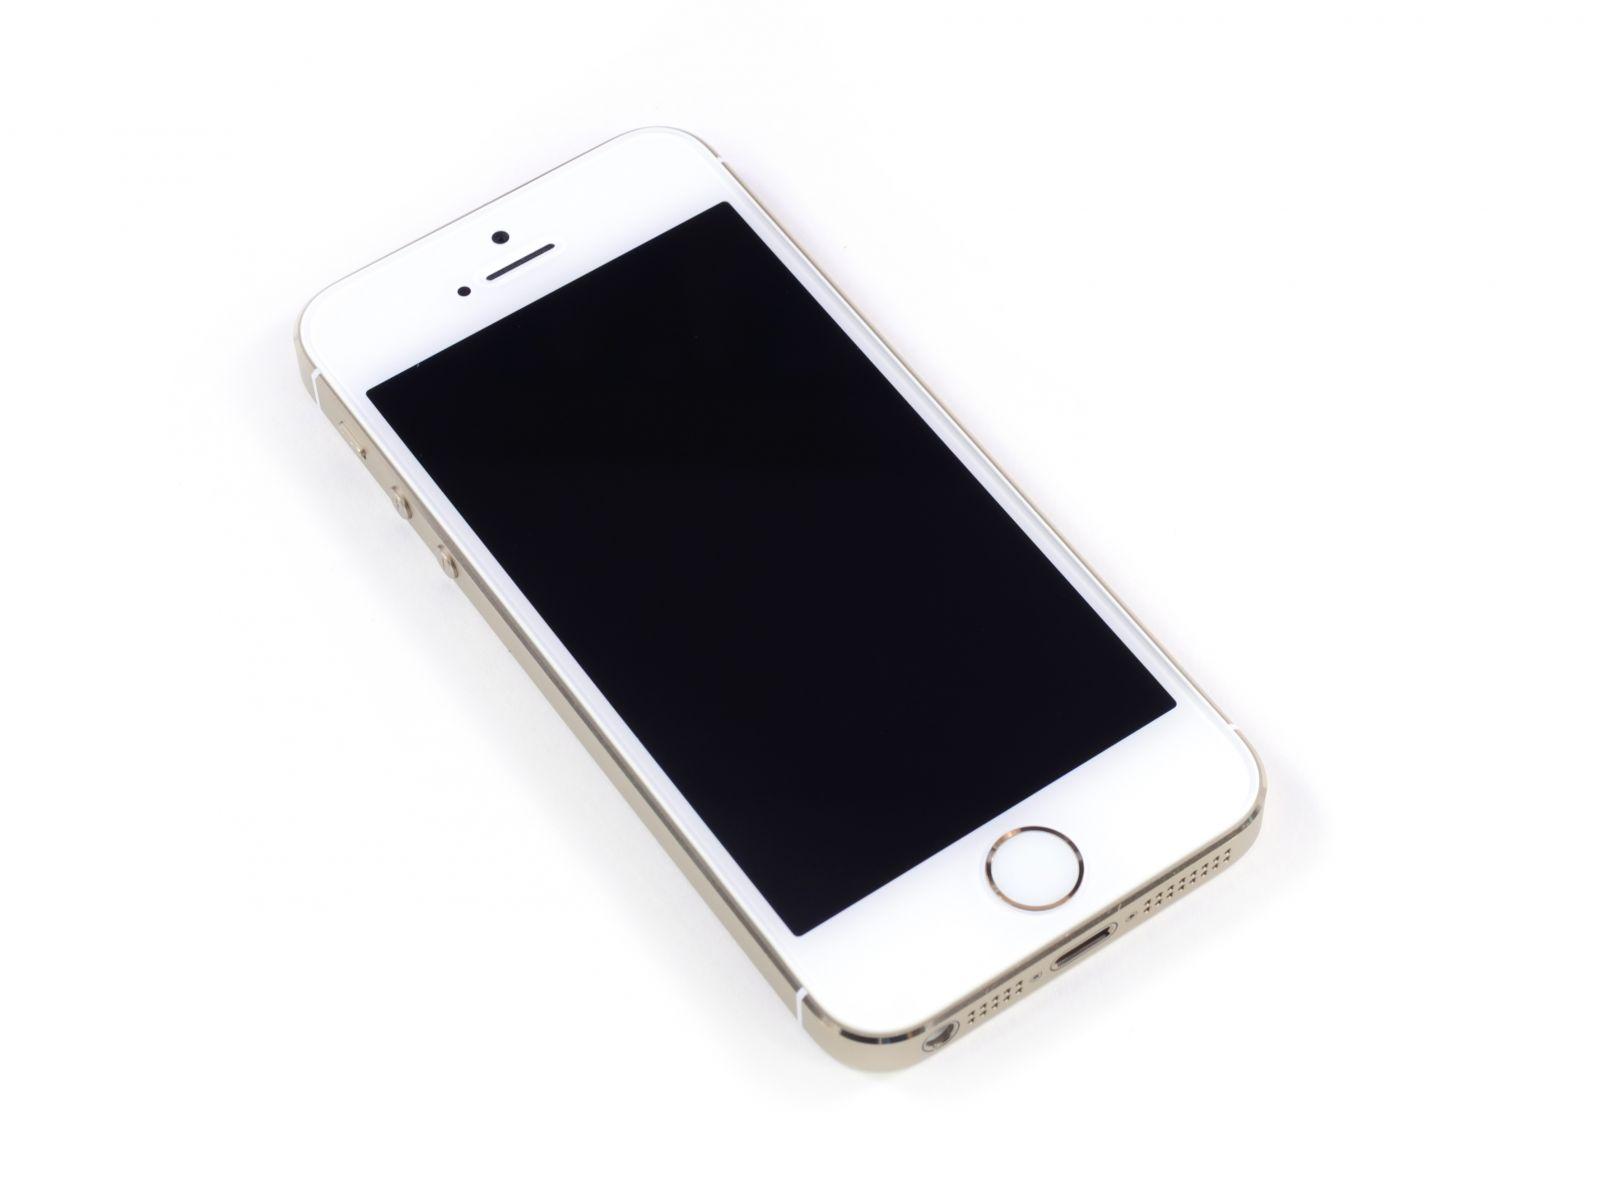 kak-razobrat-iphone-5s-05